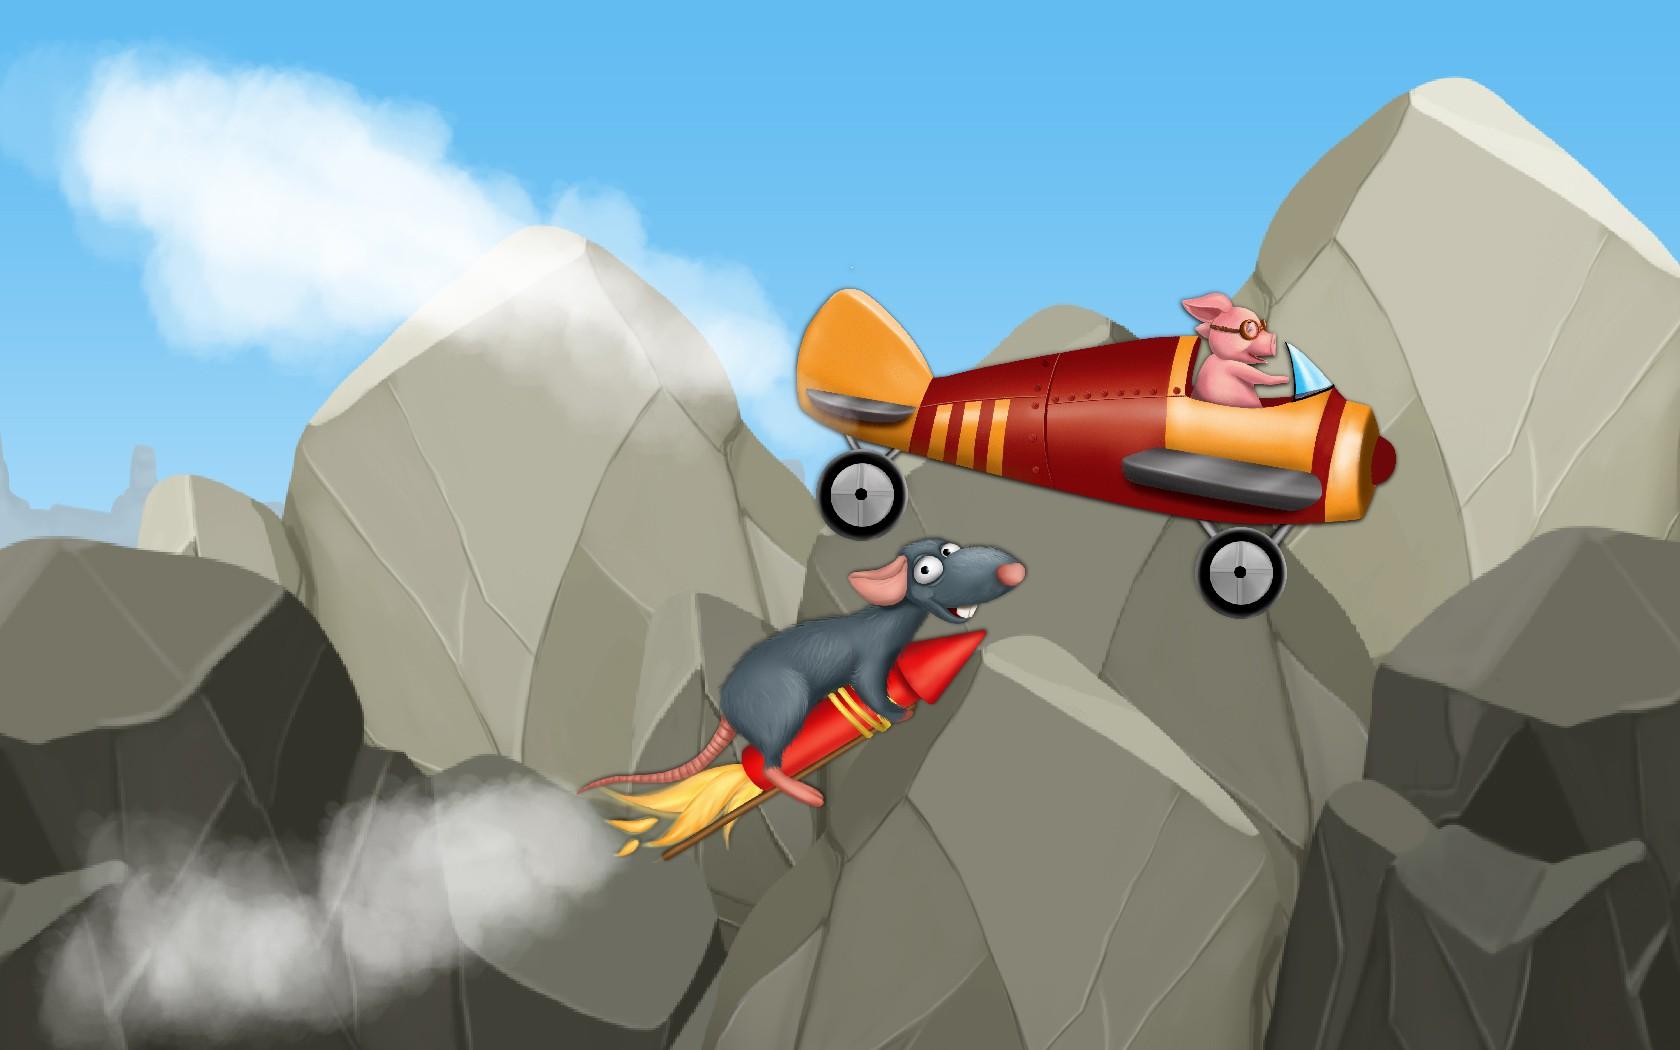 Kid airplane game